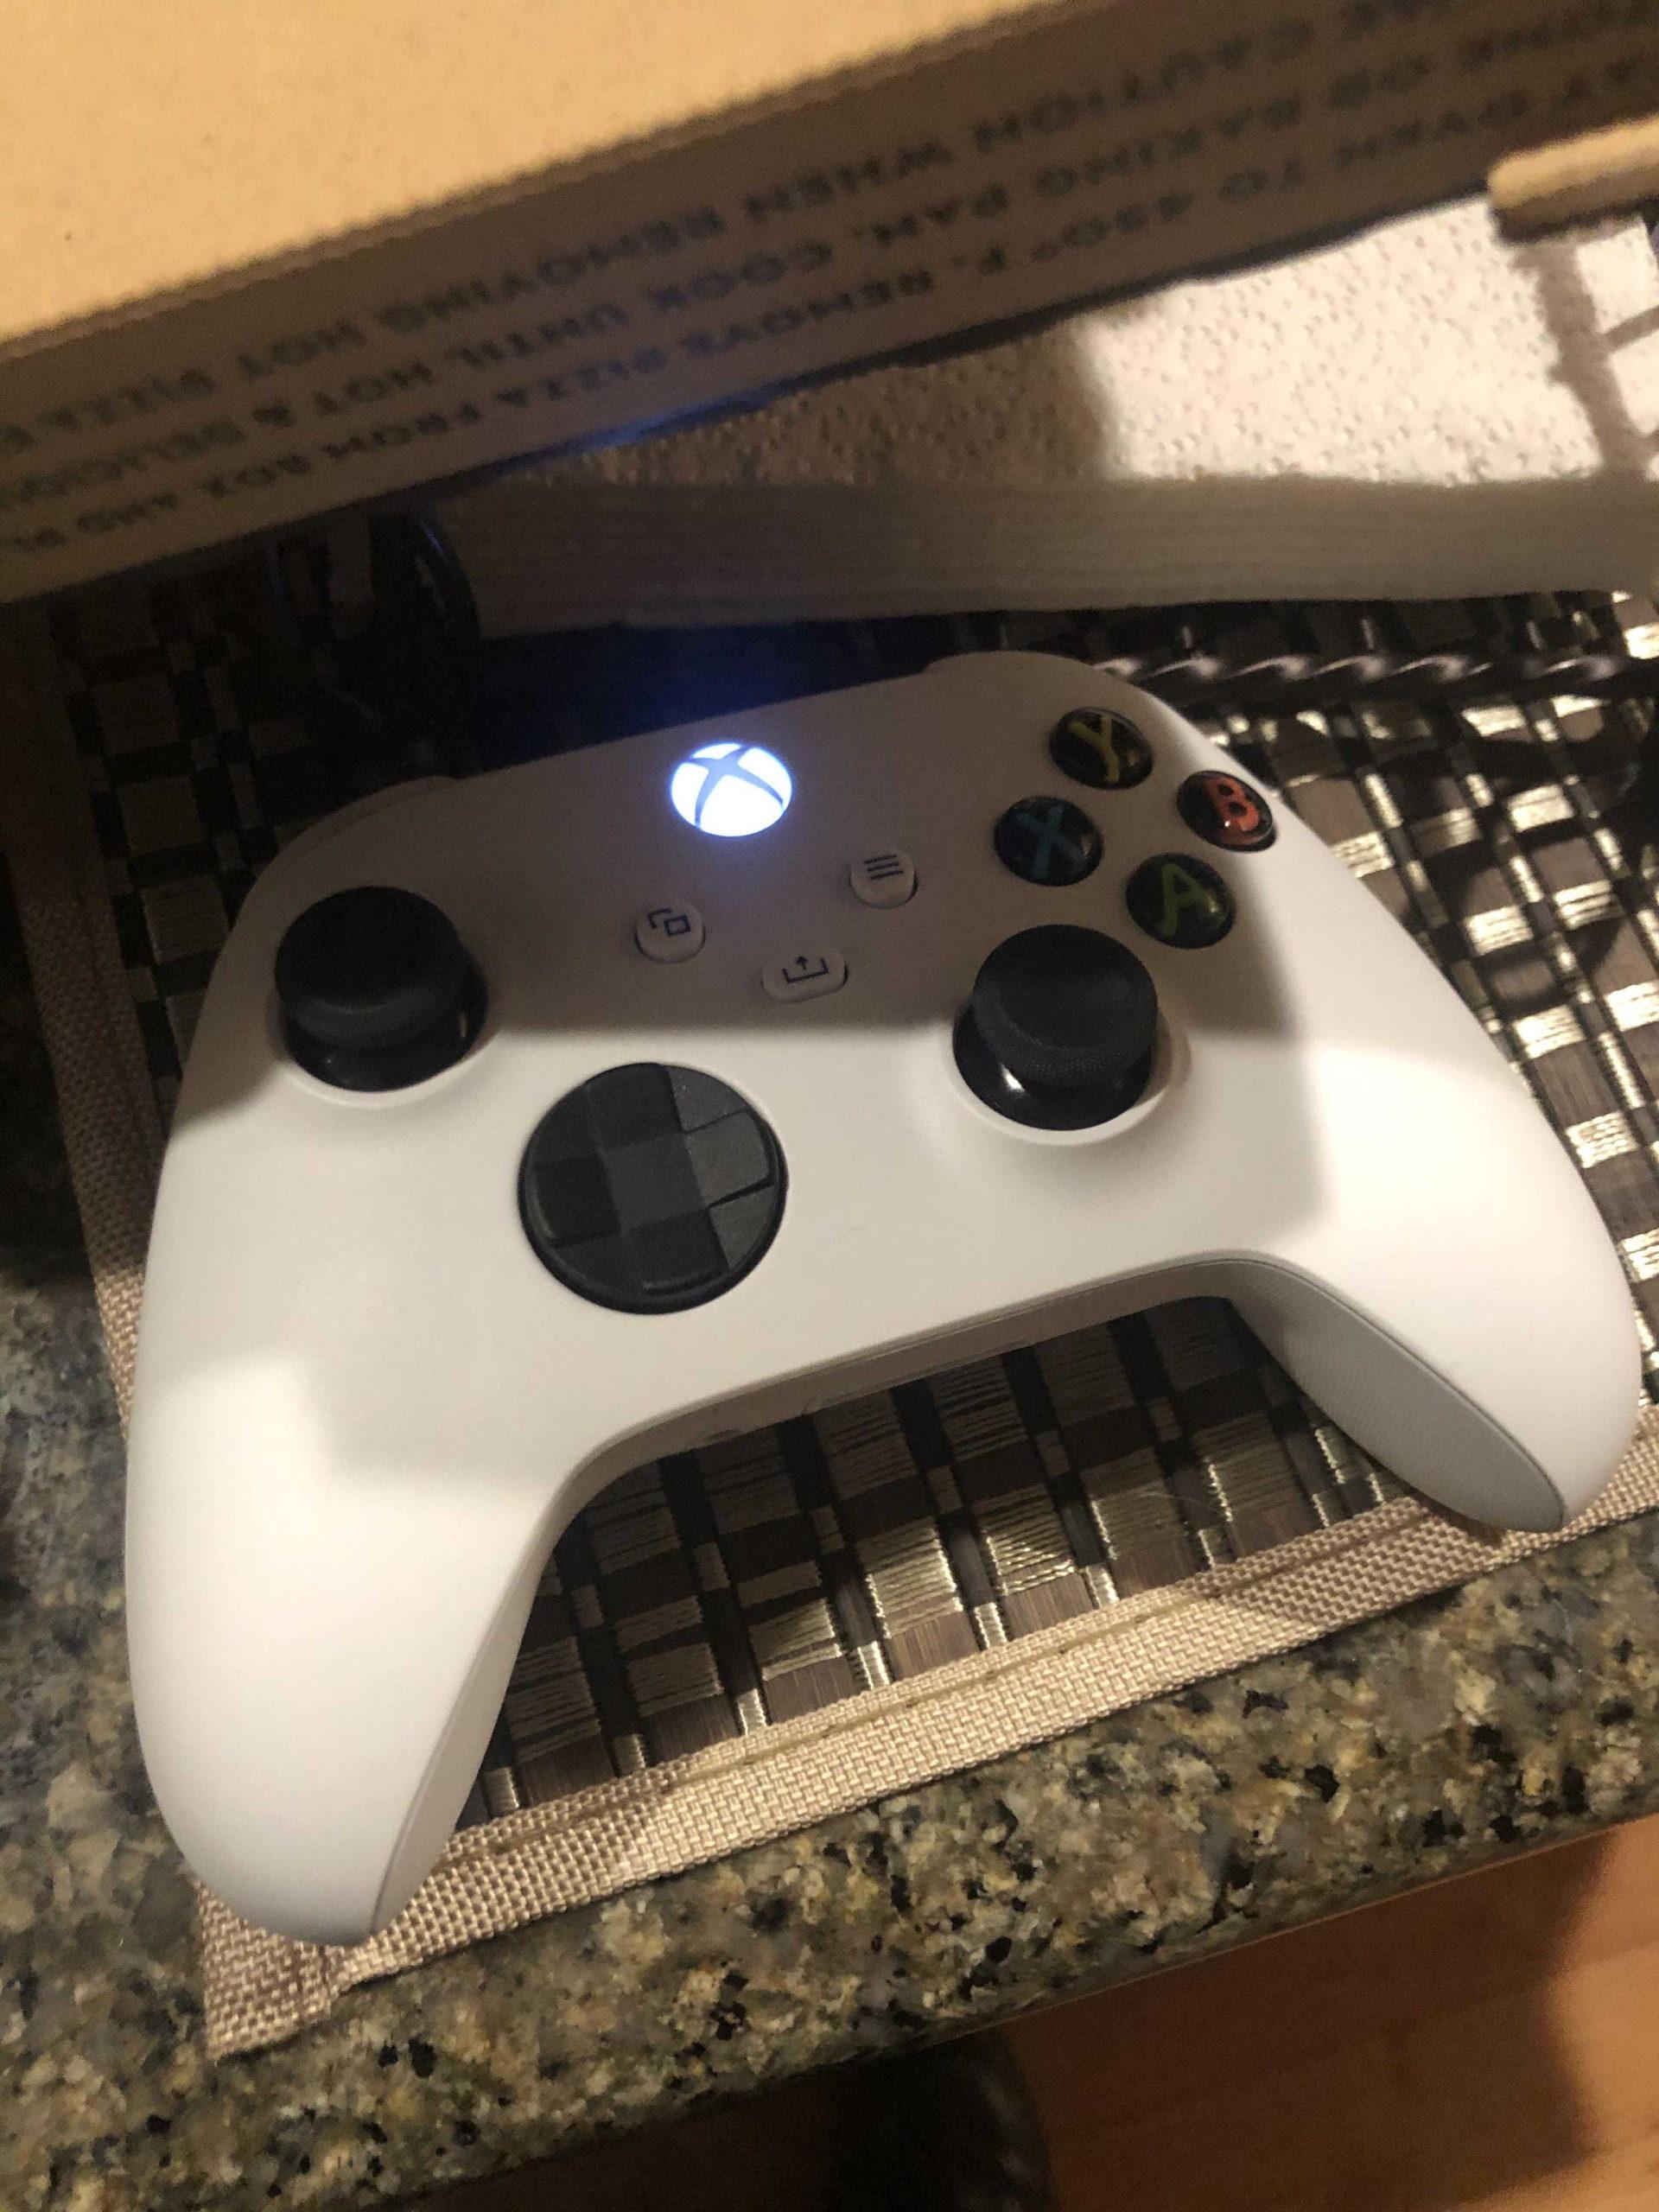 В сети появилось фото белого геймпада Xbox Series X, возможно это геймпад Xbox Series S